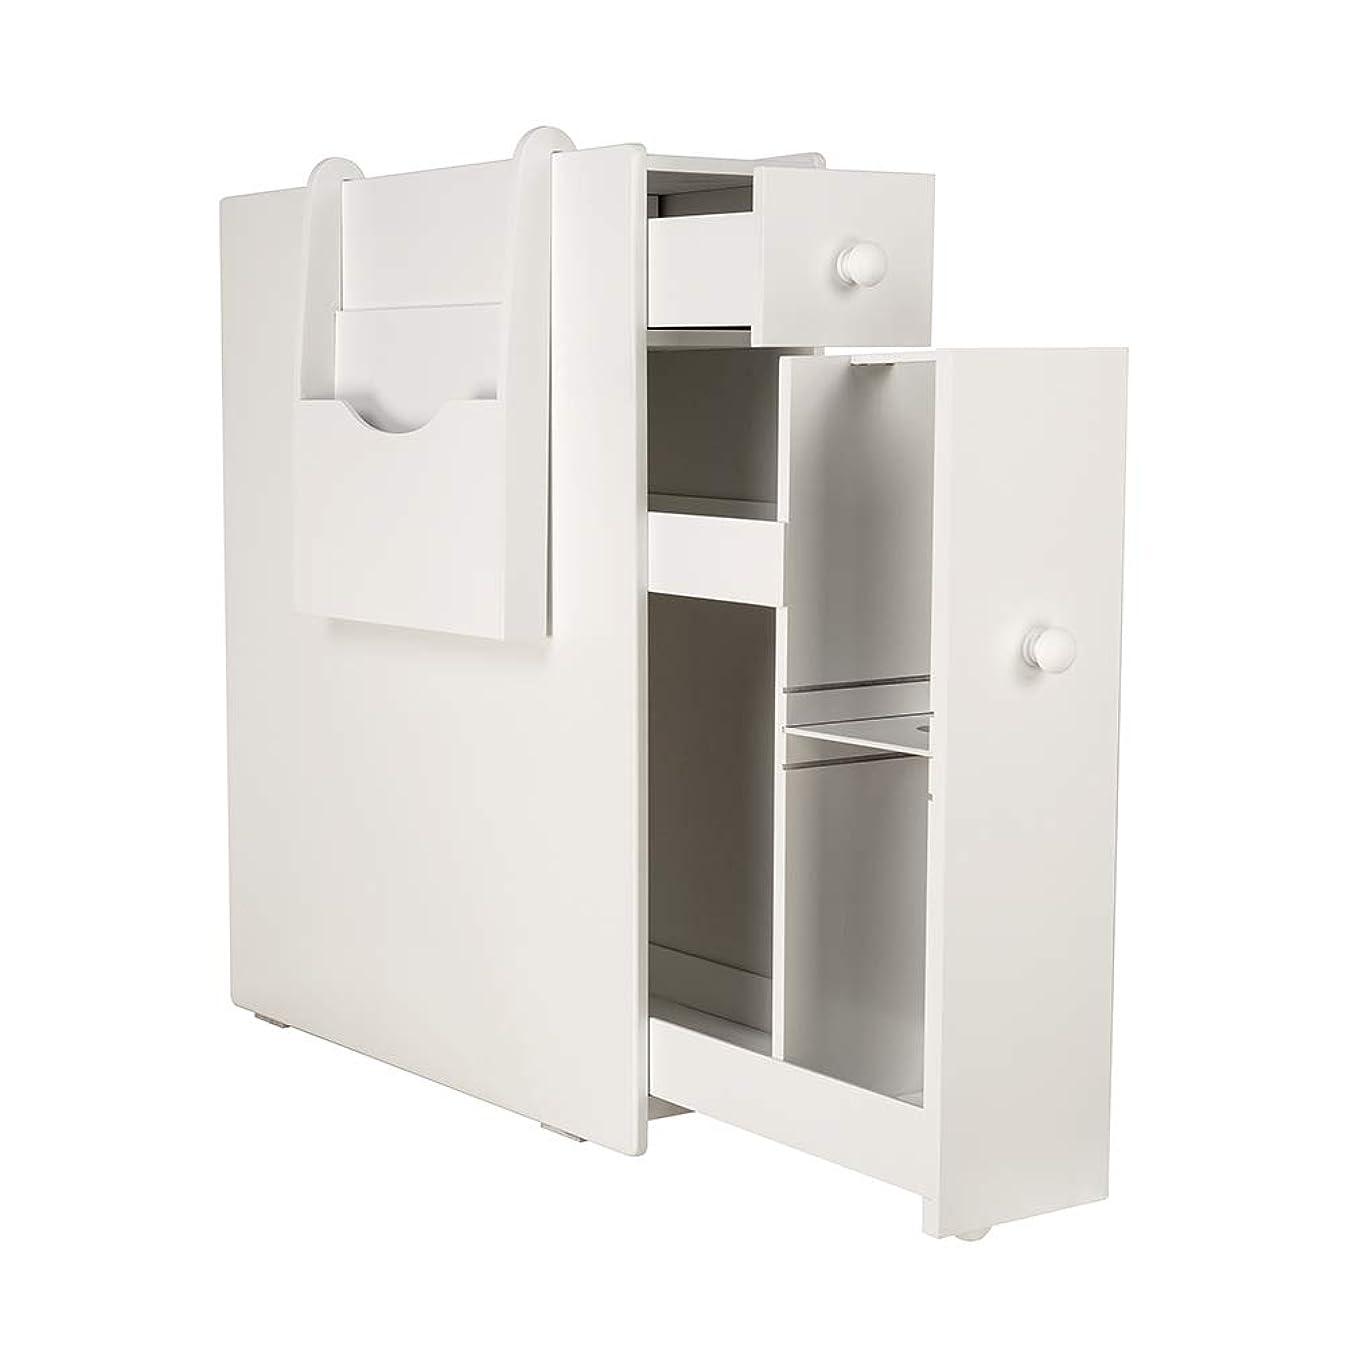 zixijiaju White Slim Bathroom Storage Cabinet Free Standing Toilet Paper Holder Bathroom Cabinet Slide Out Drawer Storage